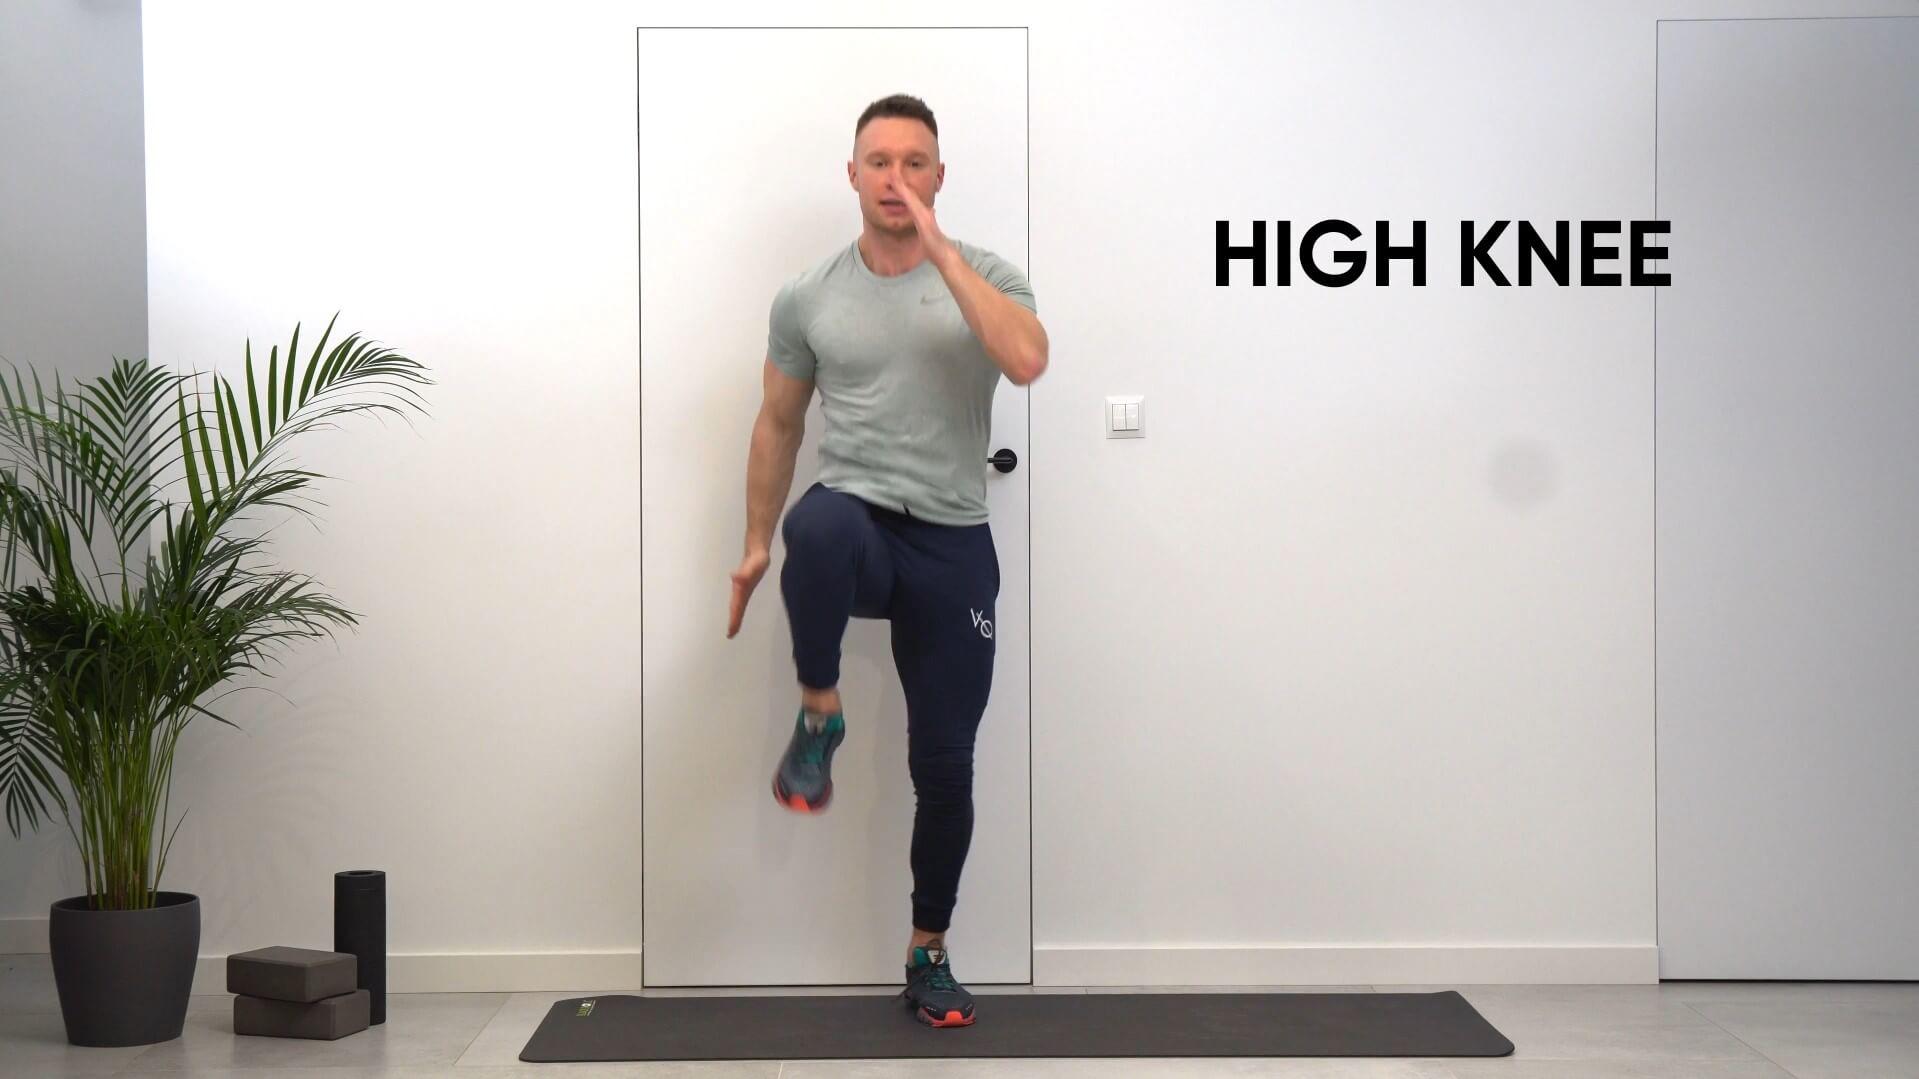 High knee